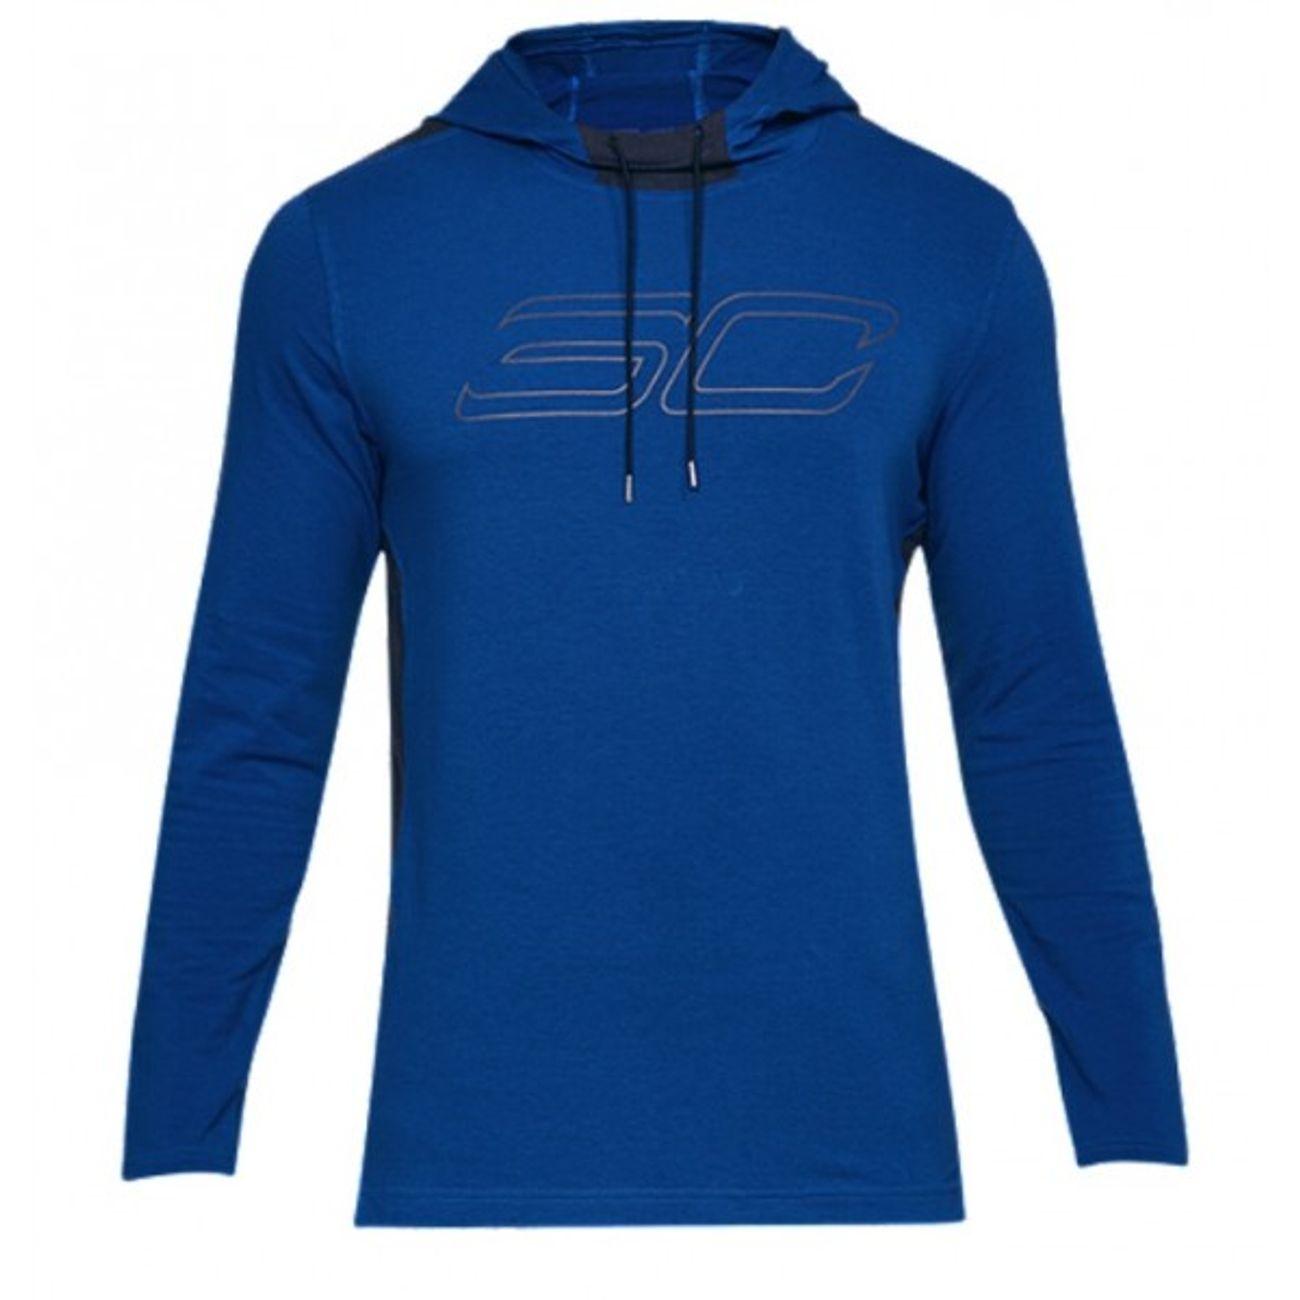 Sc30 TailleL Hooded Under Armour Pour ModeLifestyle À Bleu Capuche Adulte Sweat Homme OXwPNk08nZ